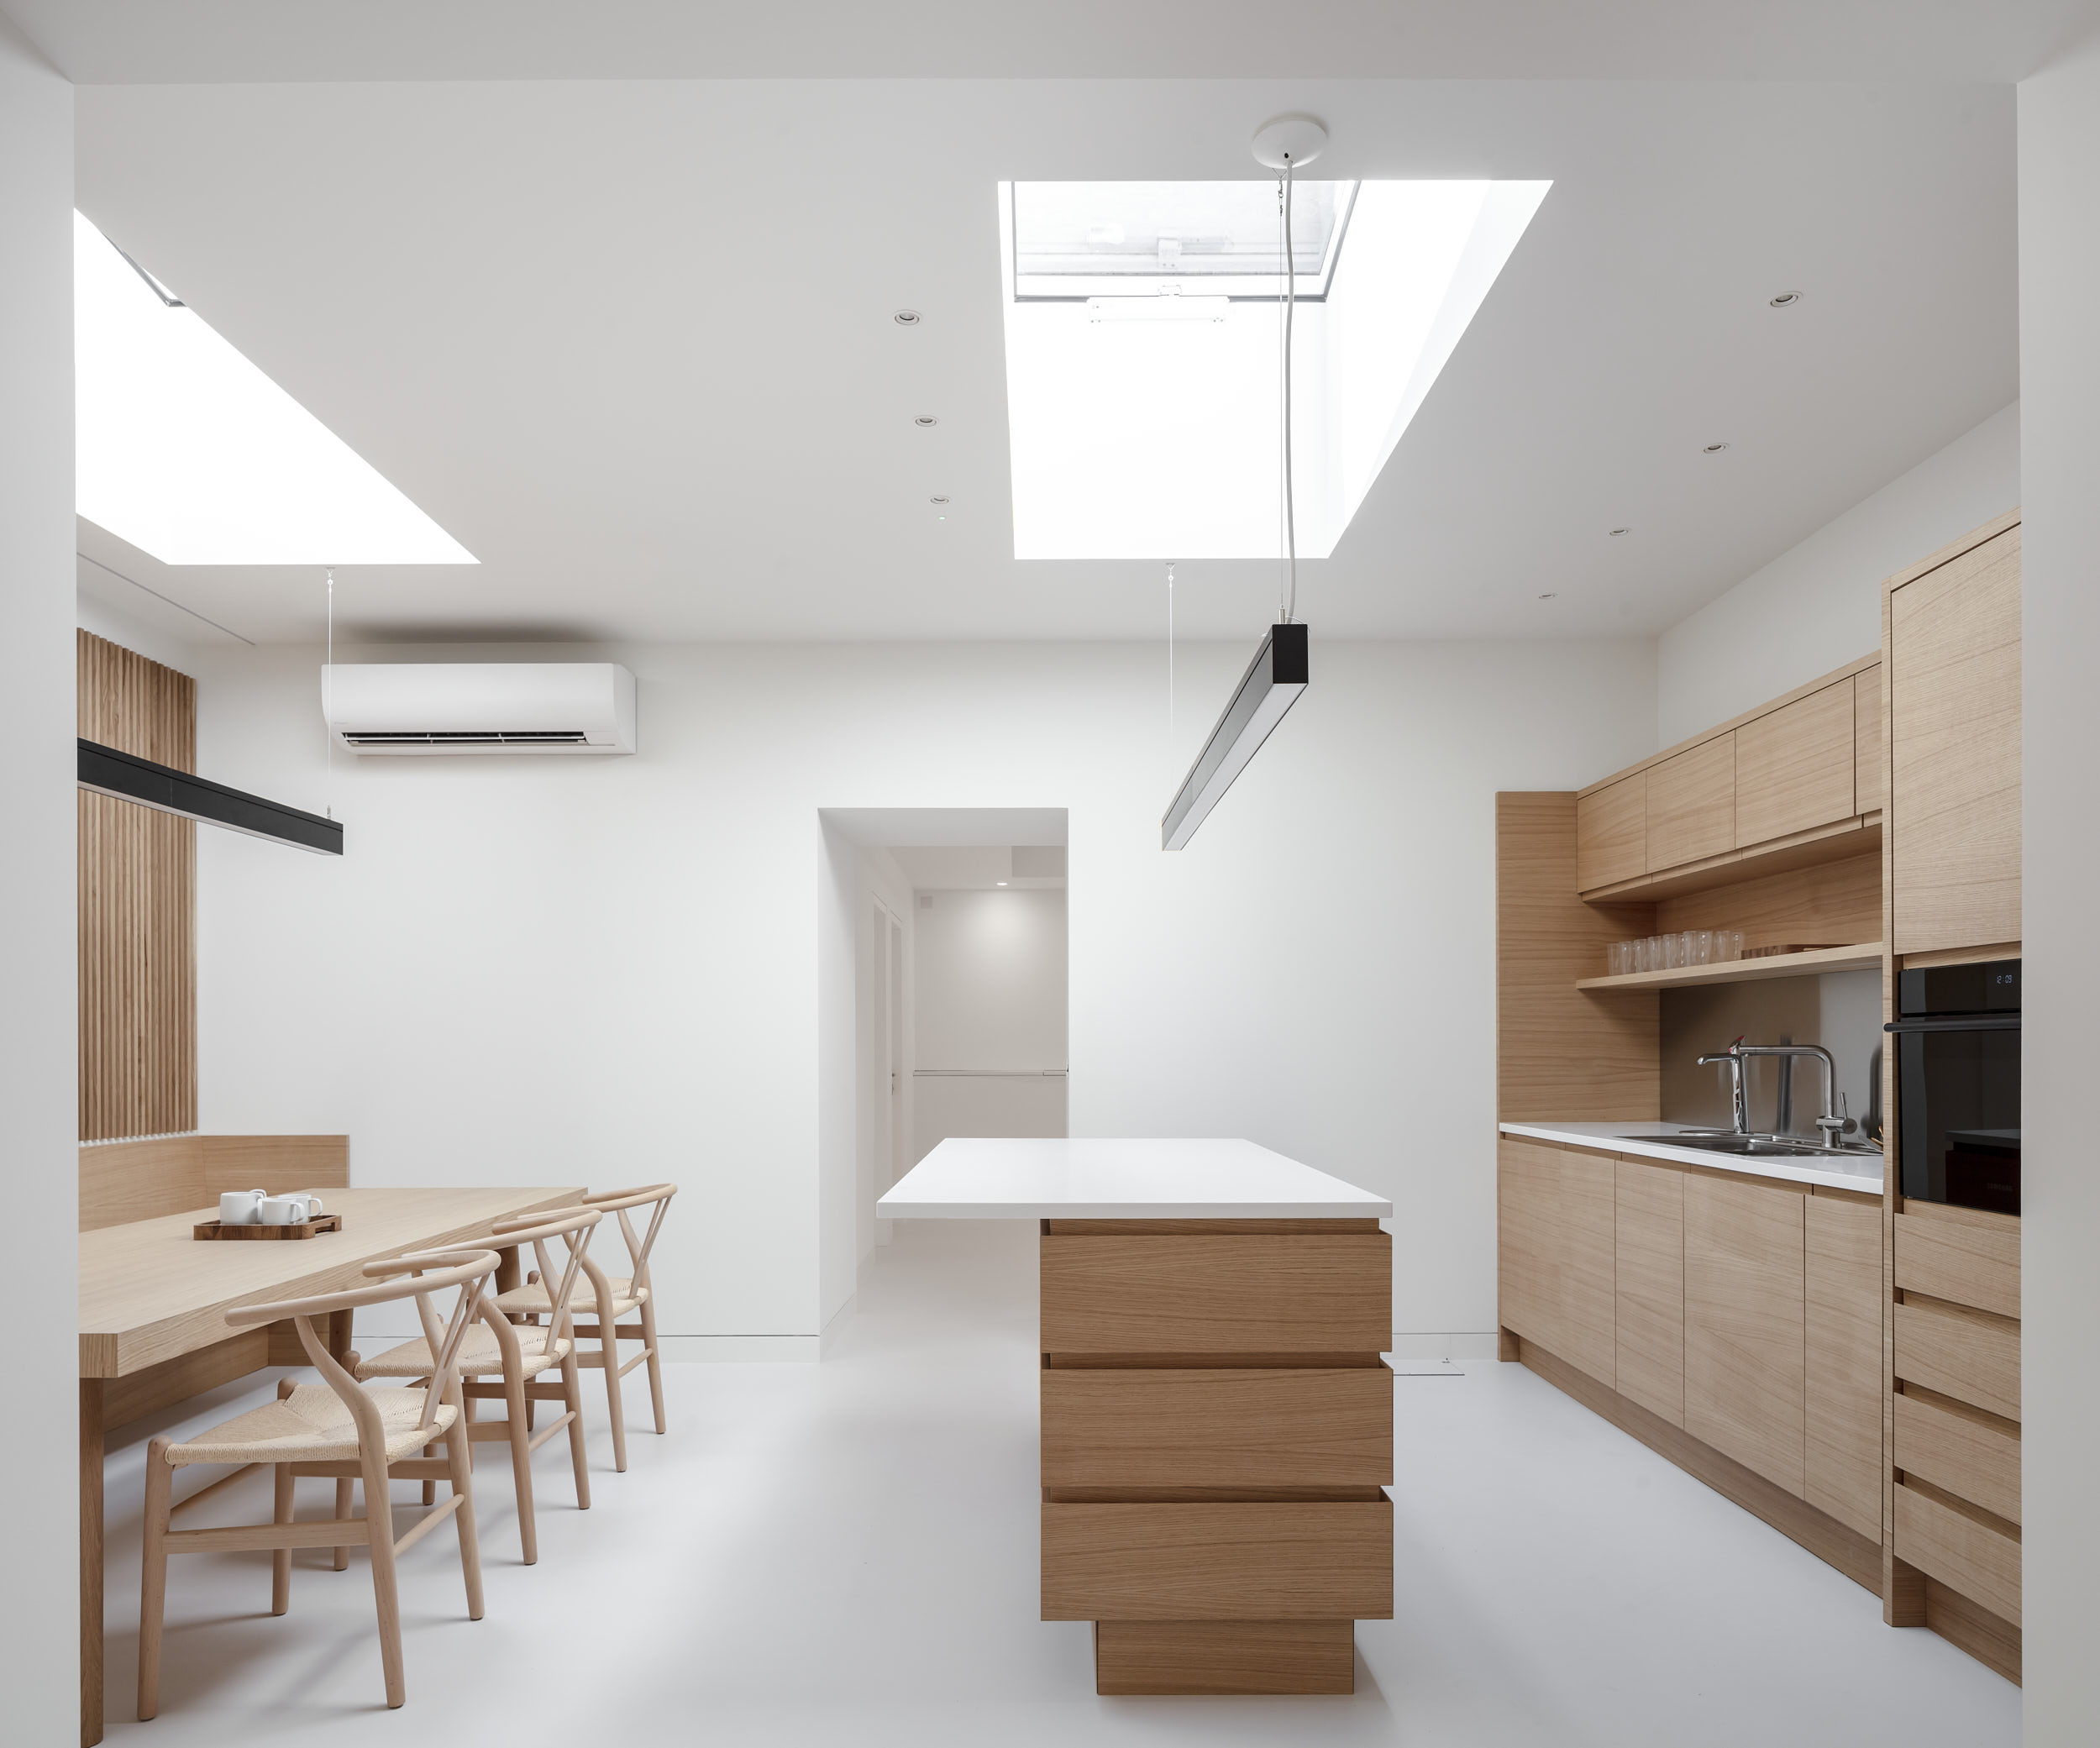 London interior kitchen architectural photography.